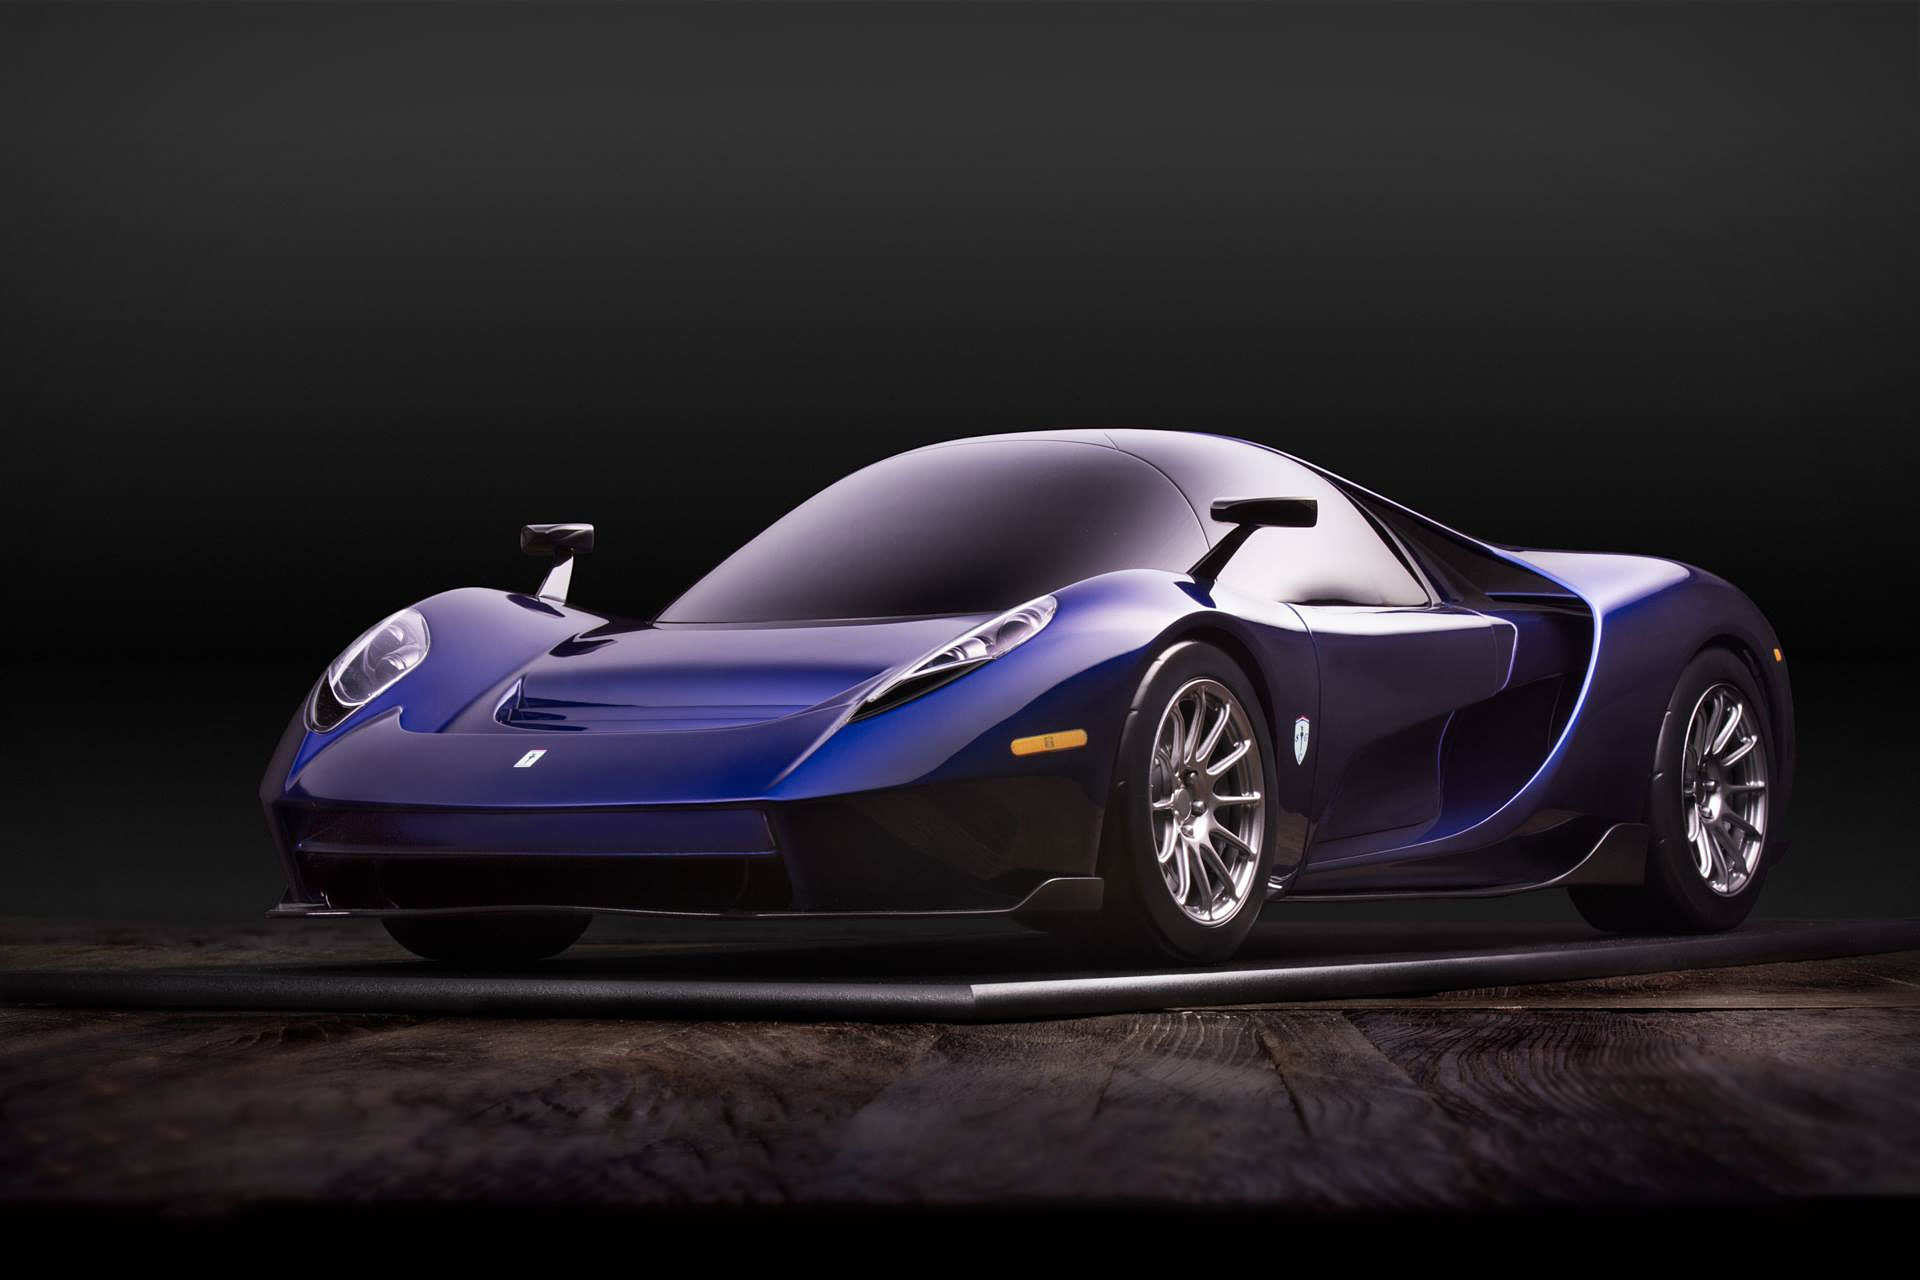 Scuderia Cameron Glickenhaus SCG 004S Supercar